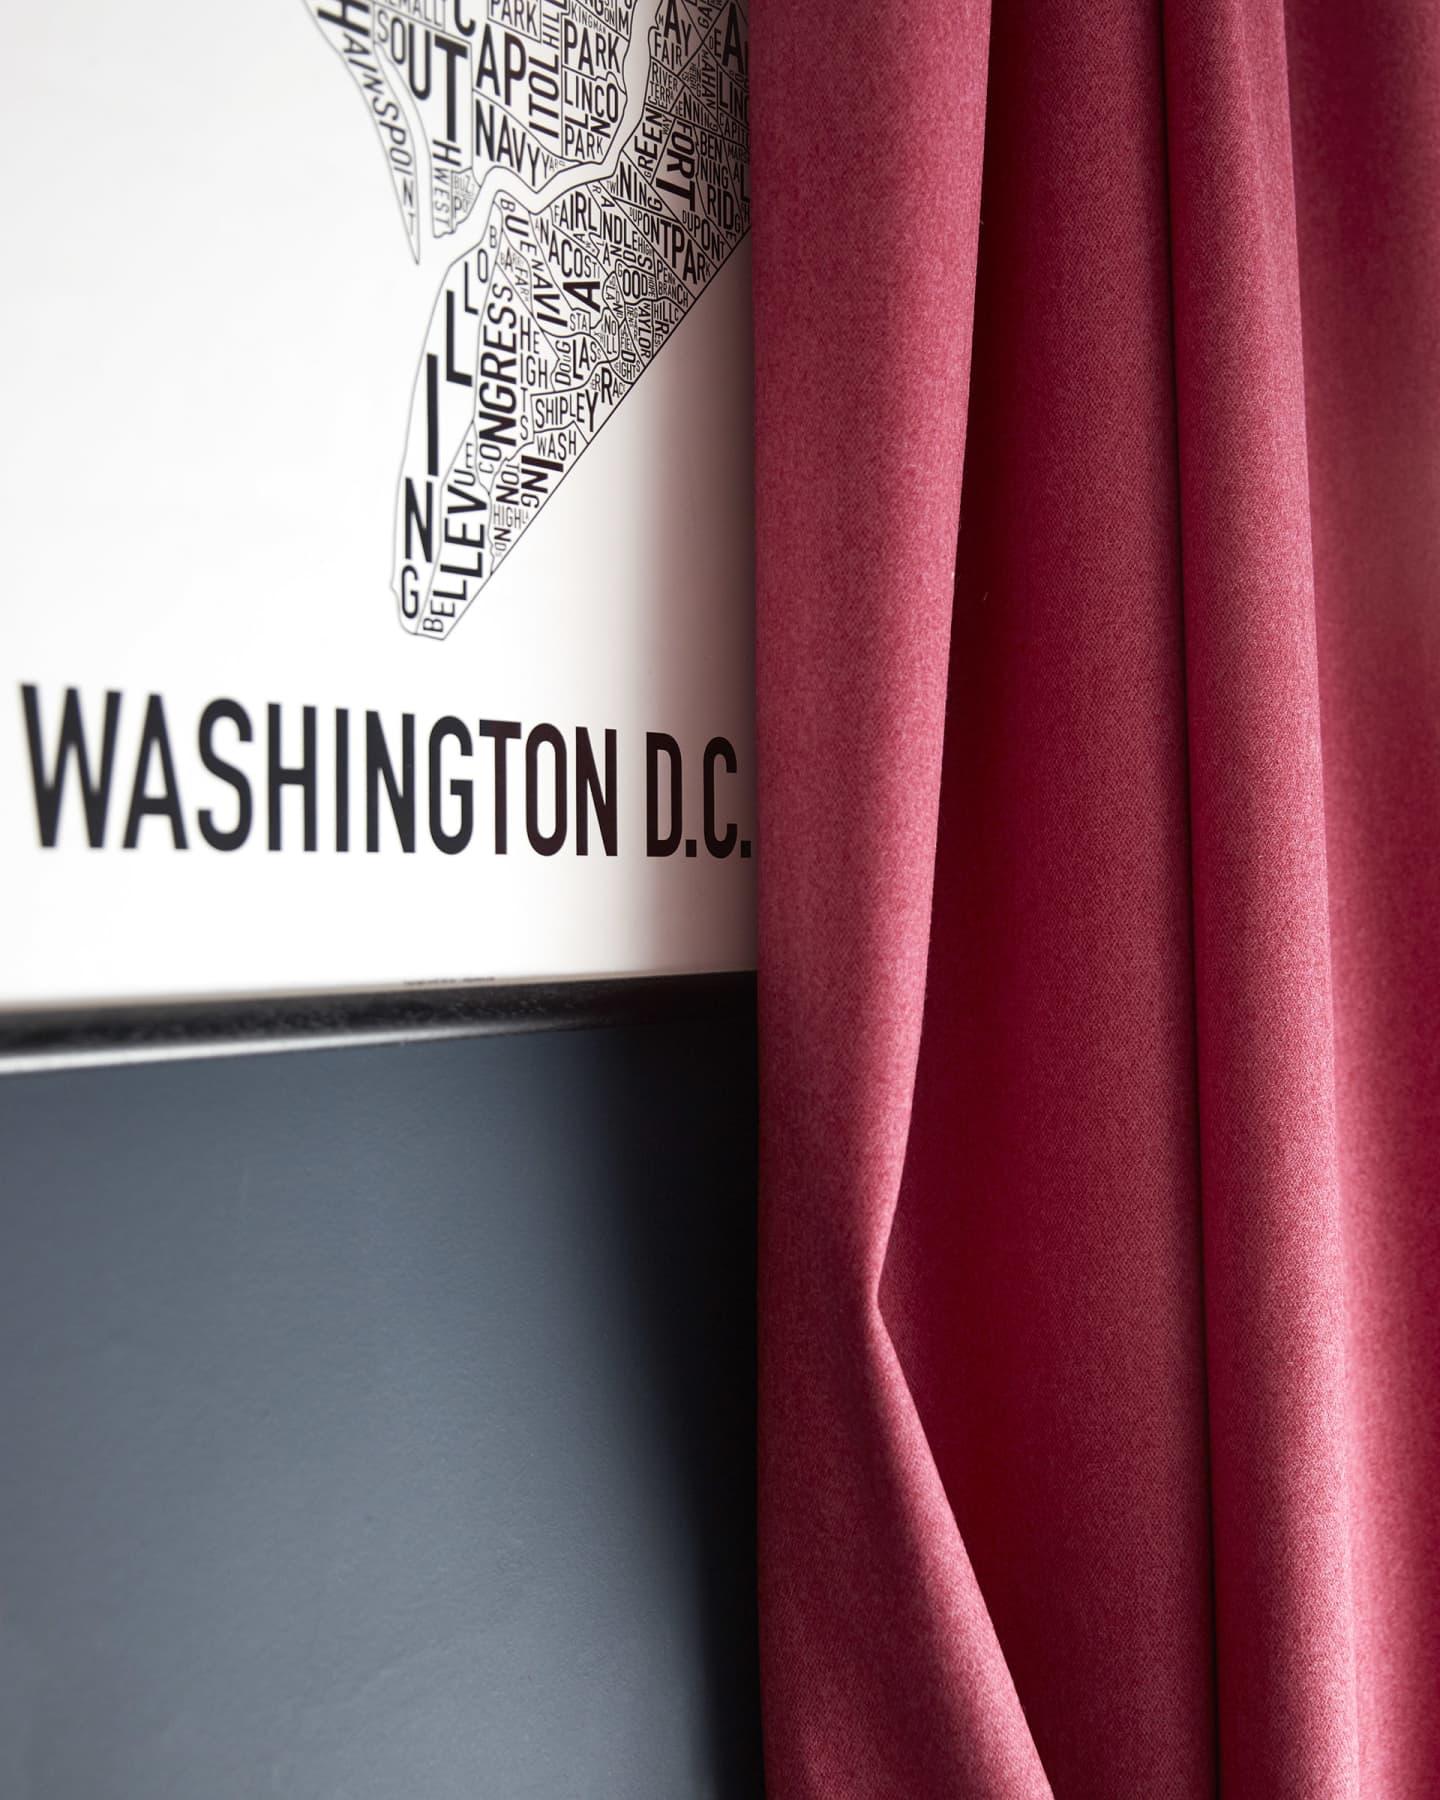 Pink woollen curtains against a dark wall